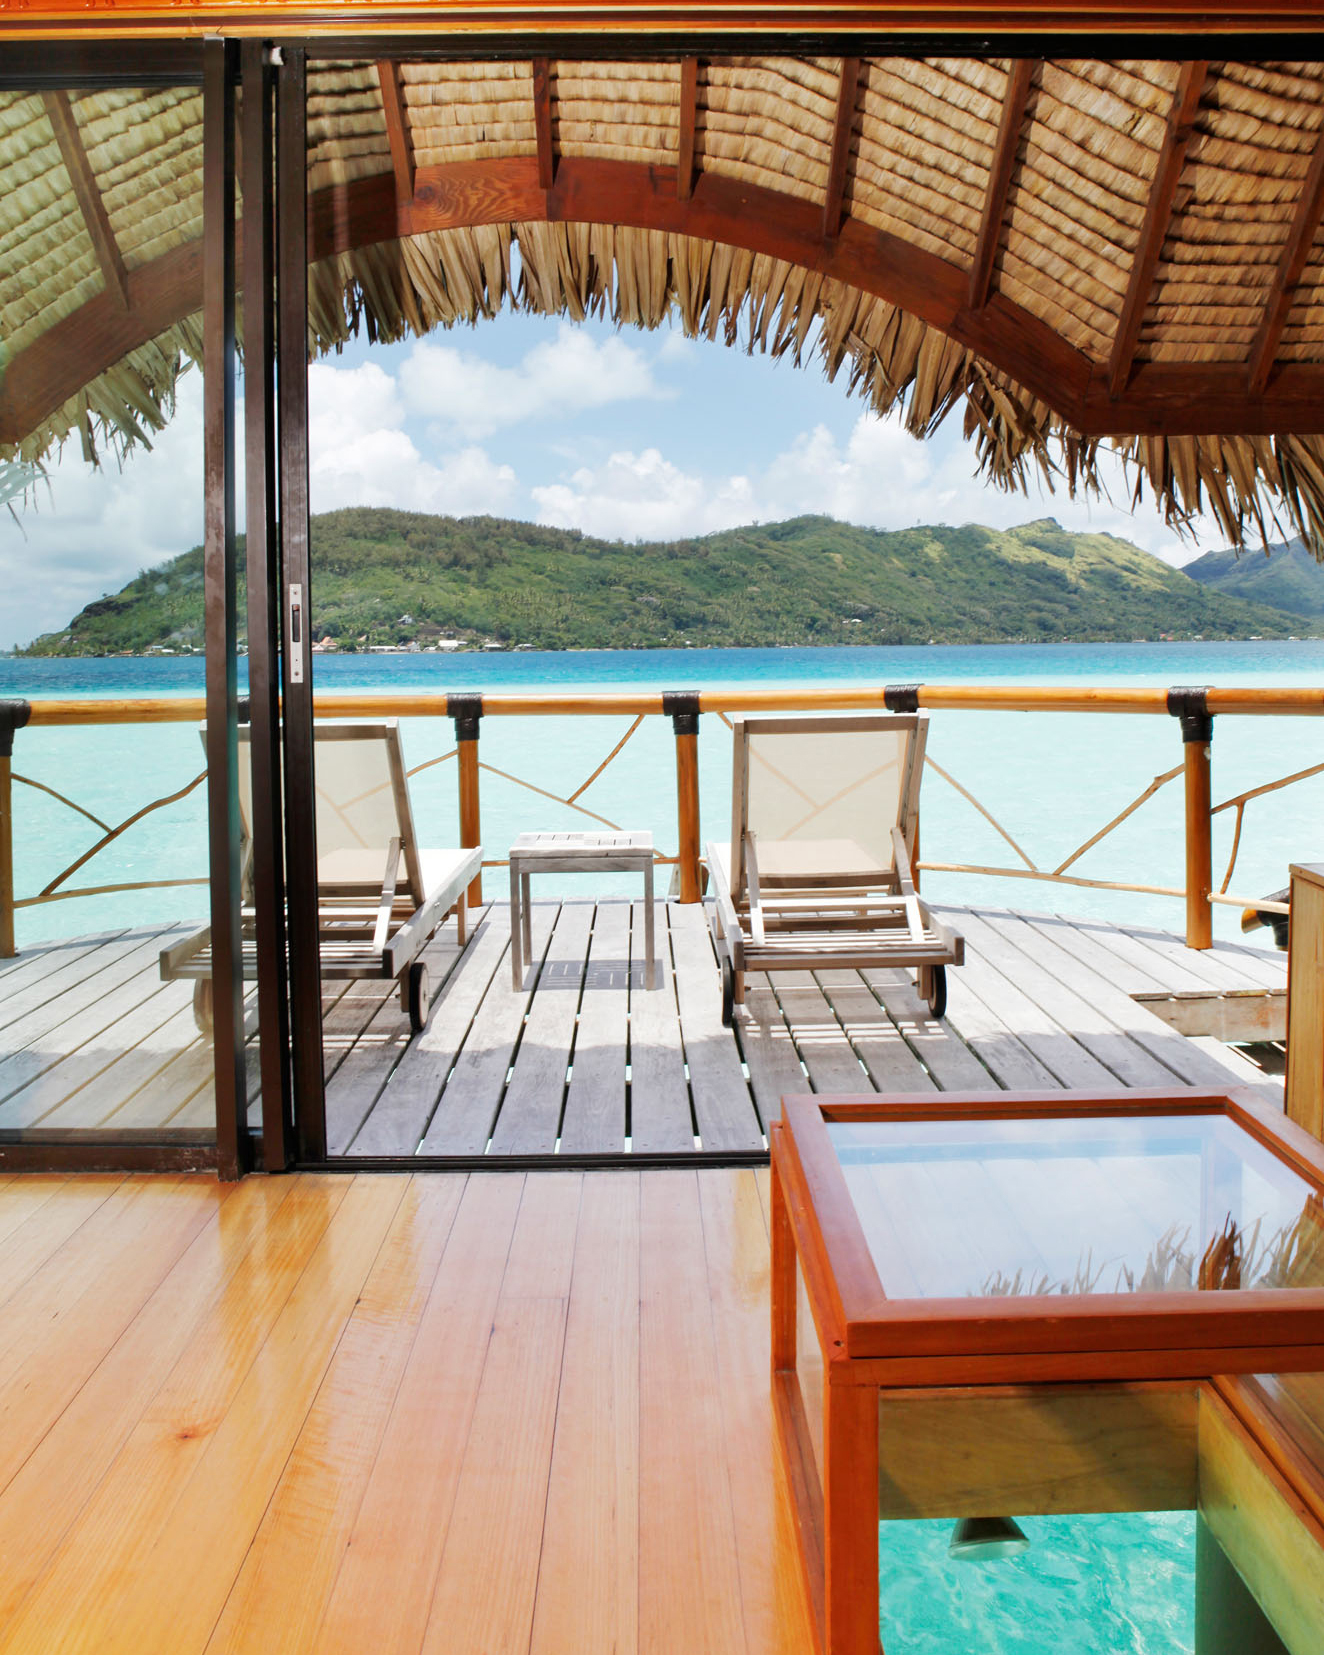 private-island-resorts-mms-pearl-beach-bora-bora-1214.jpg